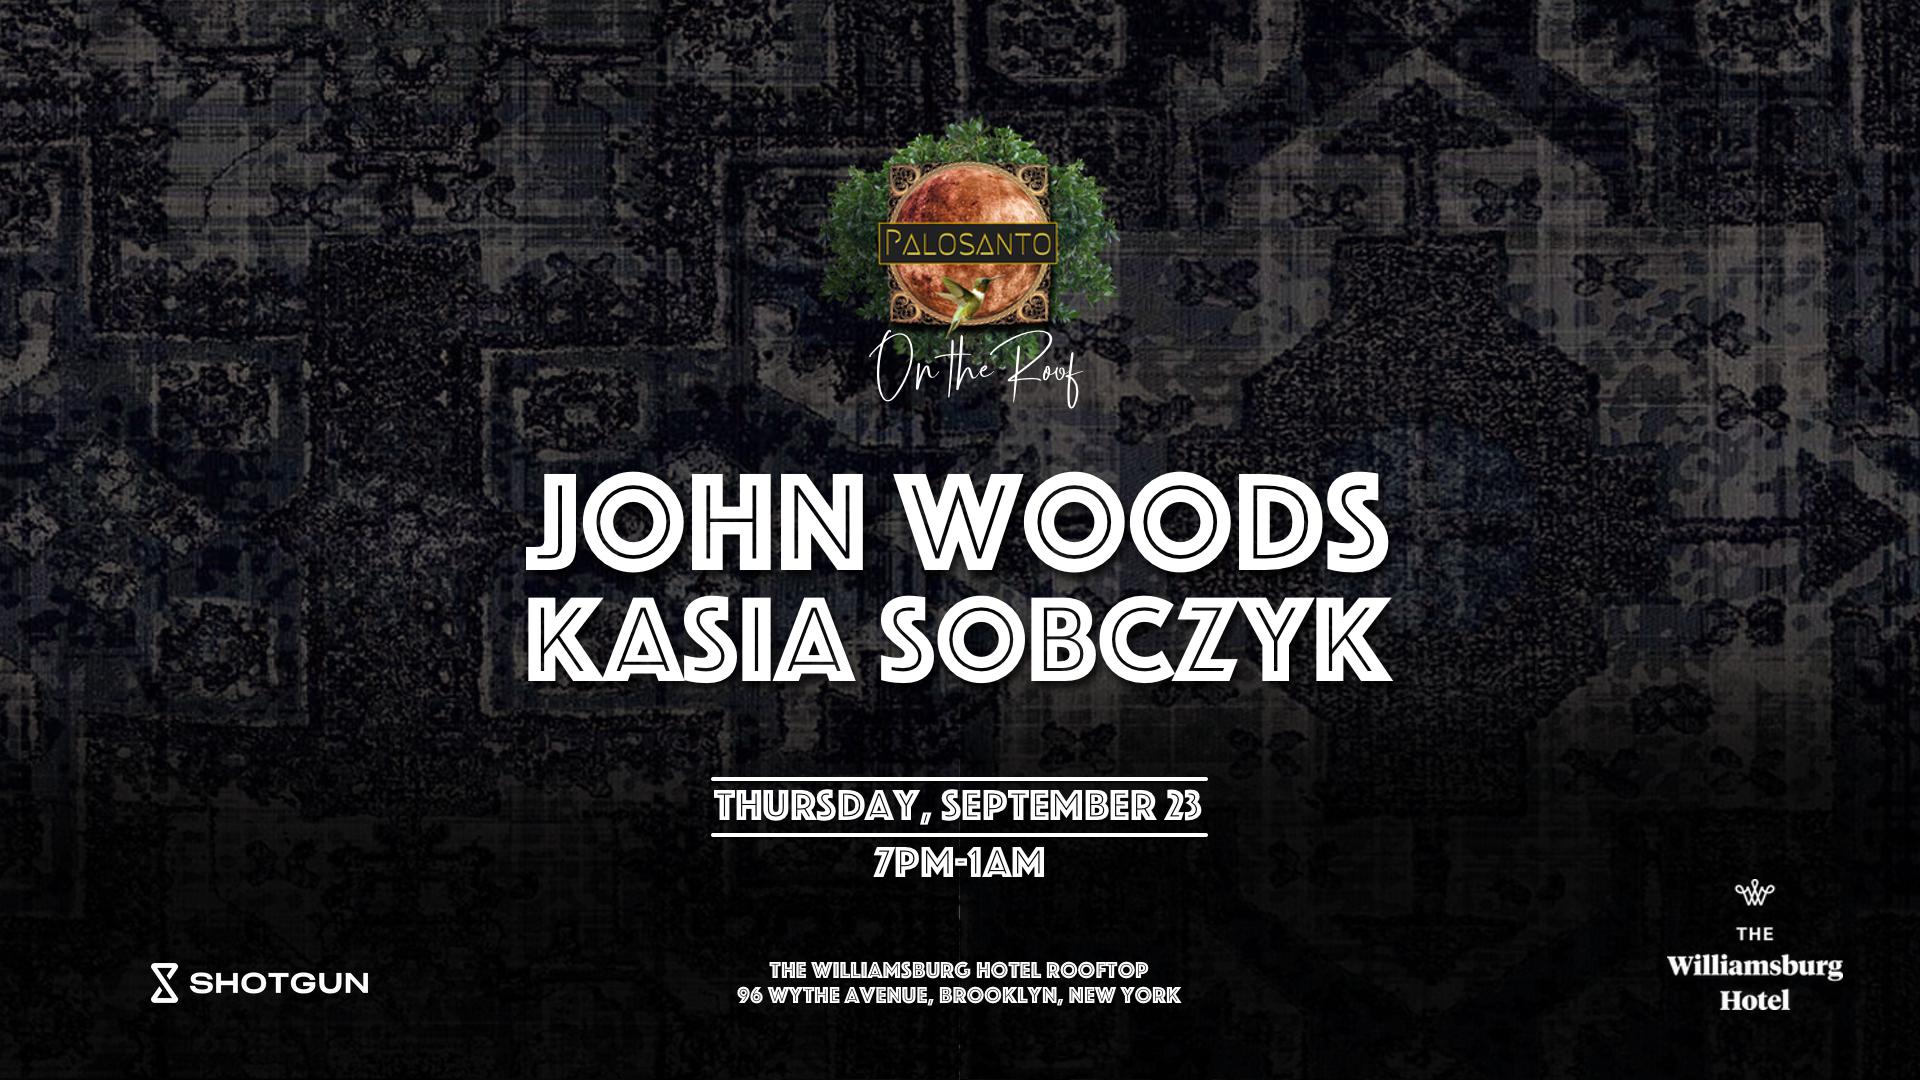 On The Roof: John Woods, Kasia Sobczyk